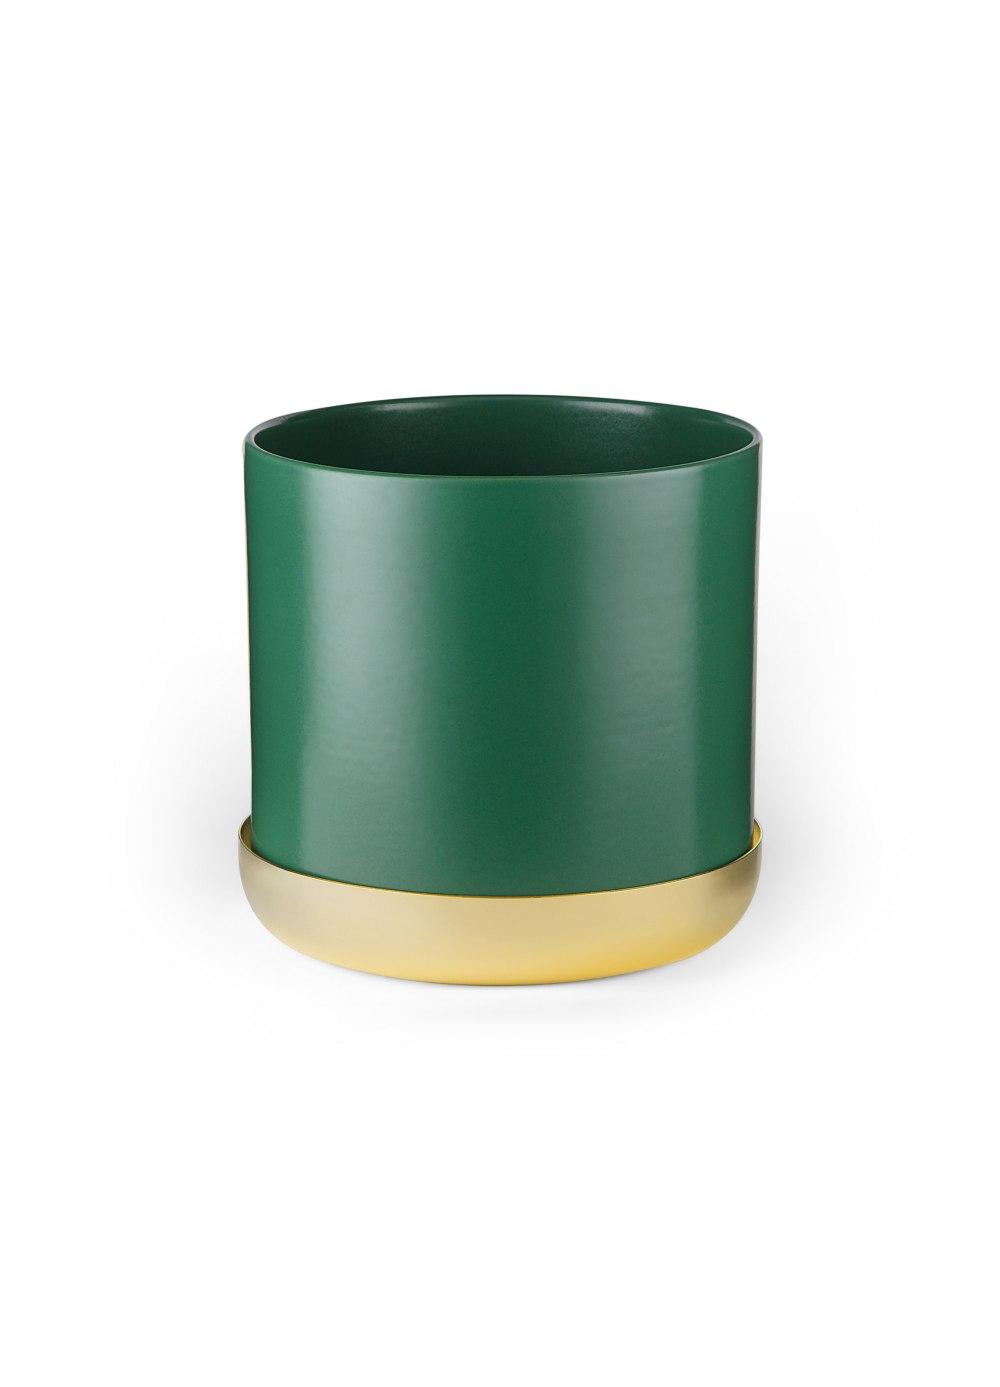 SKULTUNA Nurture Planter Large Green with Tray 621-G-L